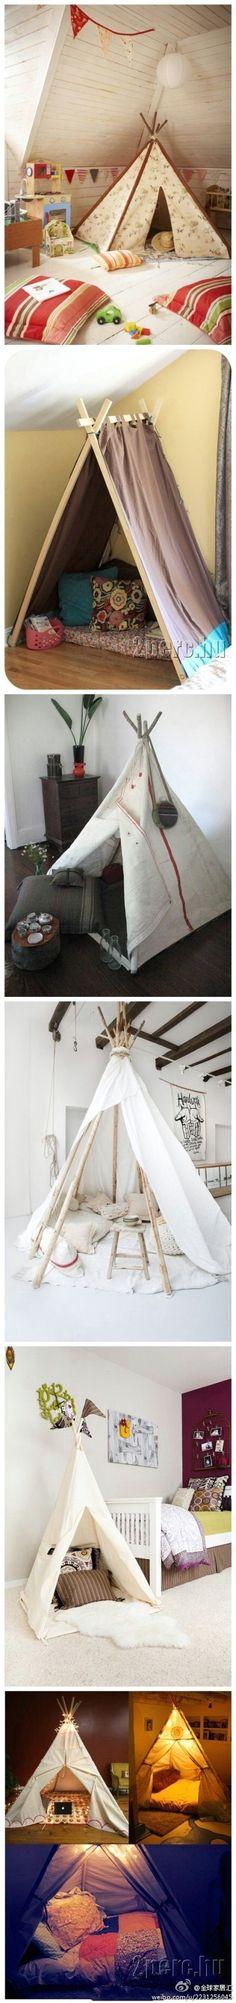 play tents, kid playroom, grand kids, kids tents, kid rooms